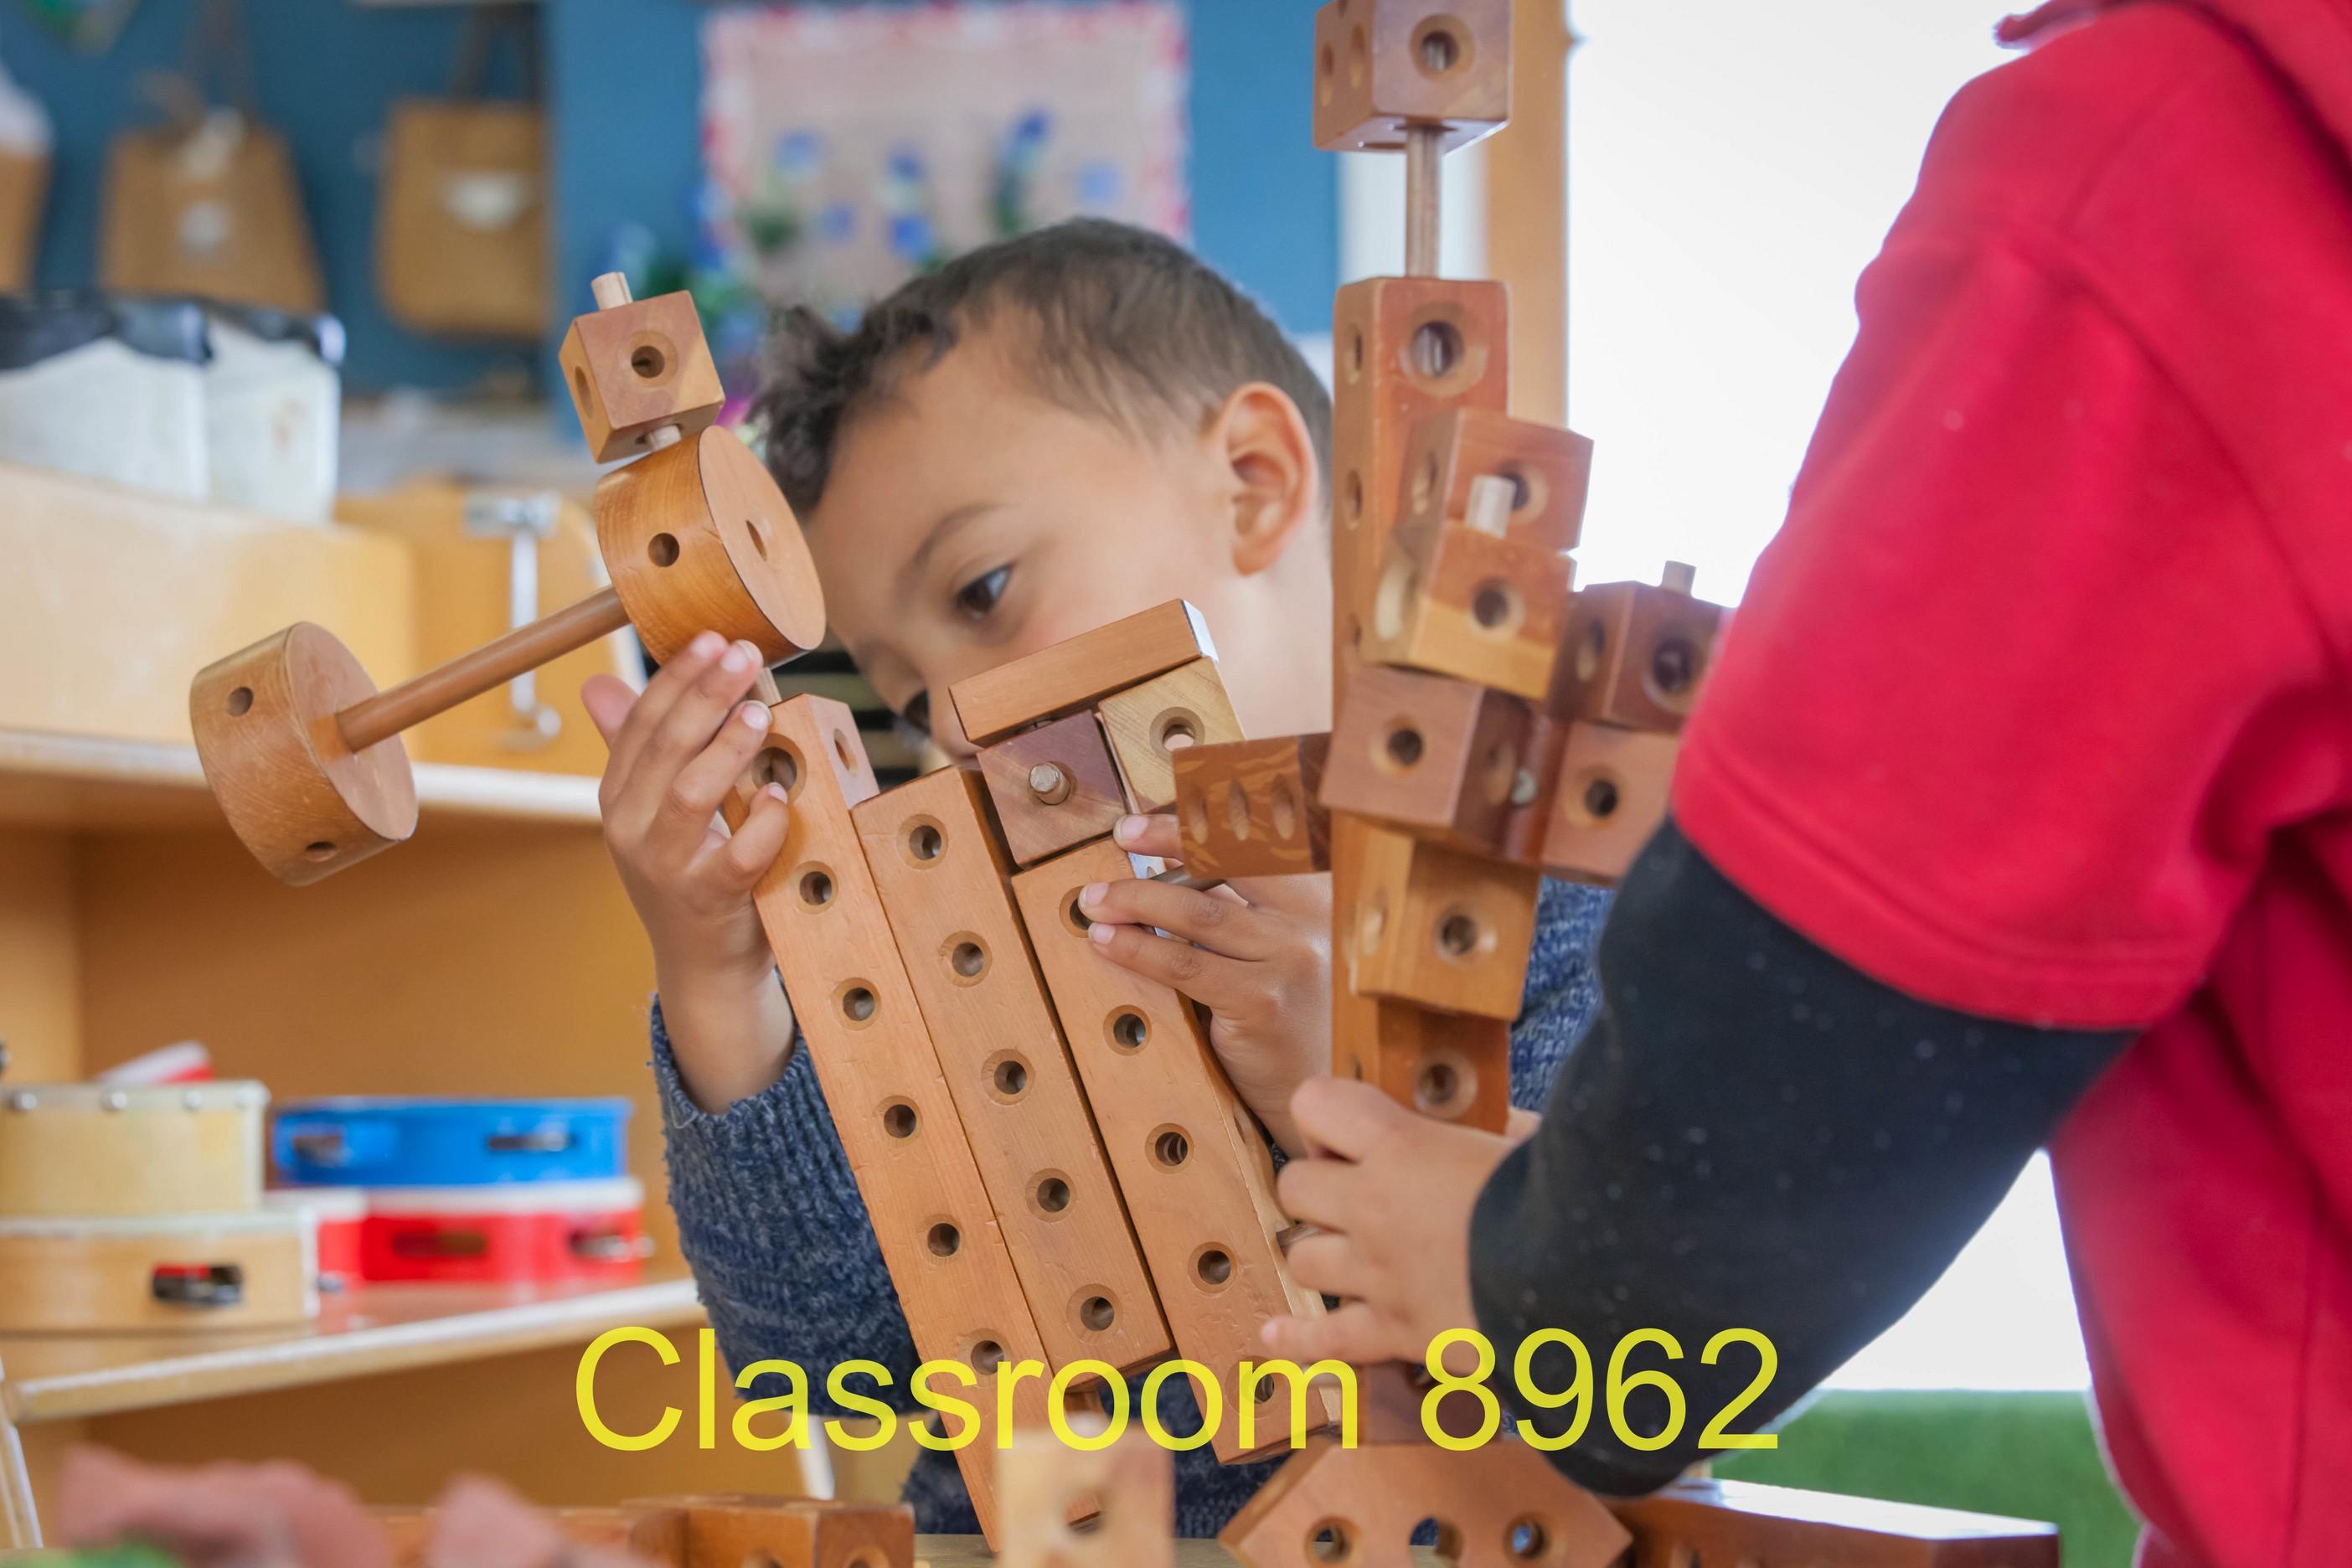 Classroom 8962